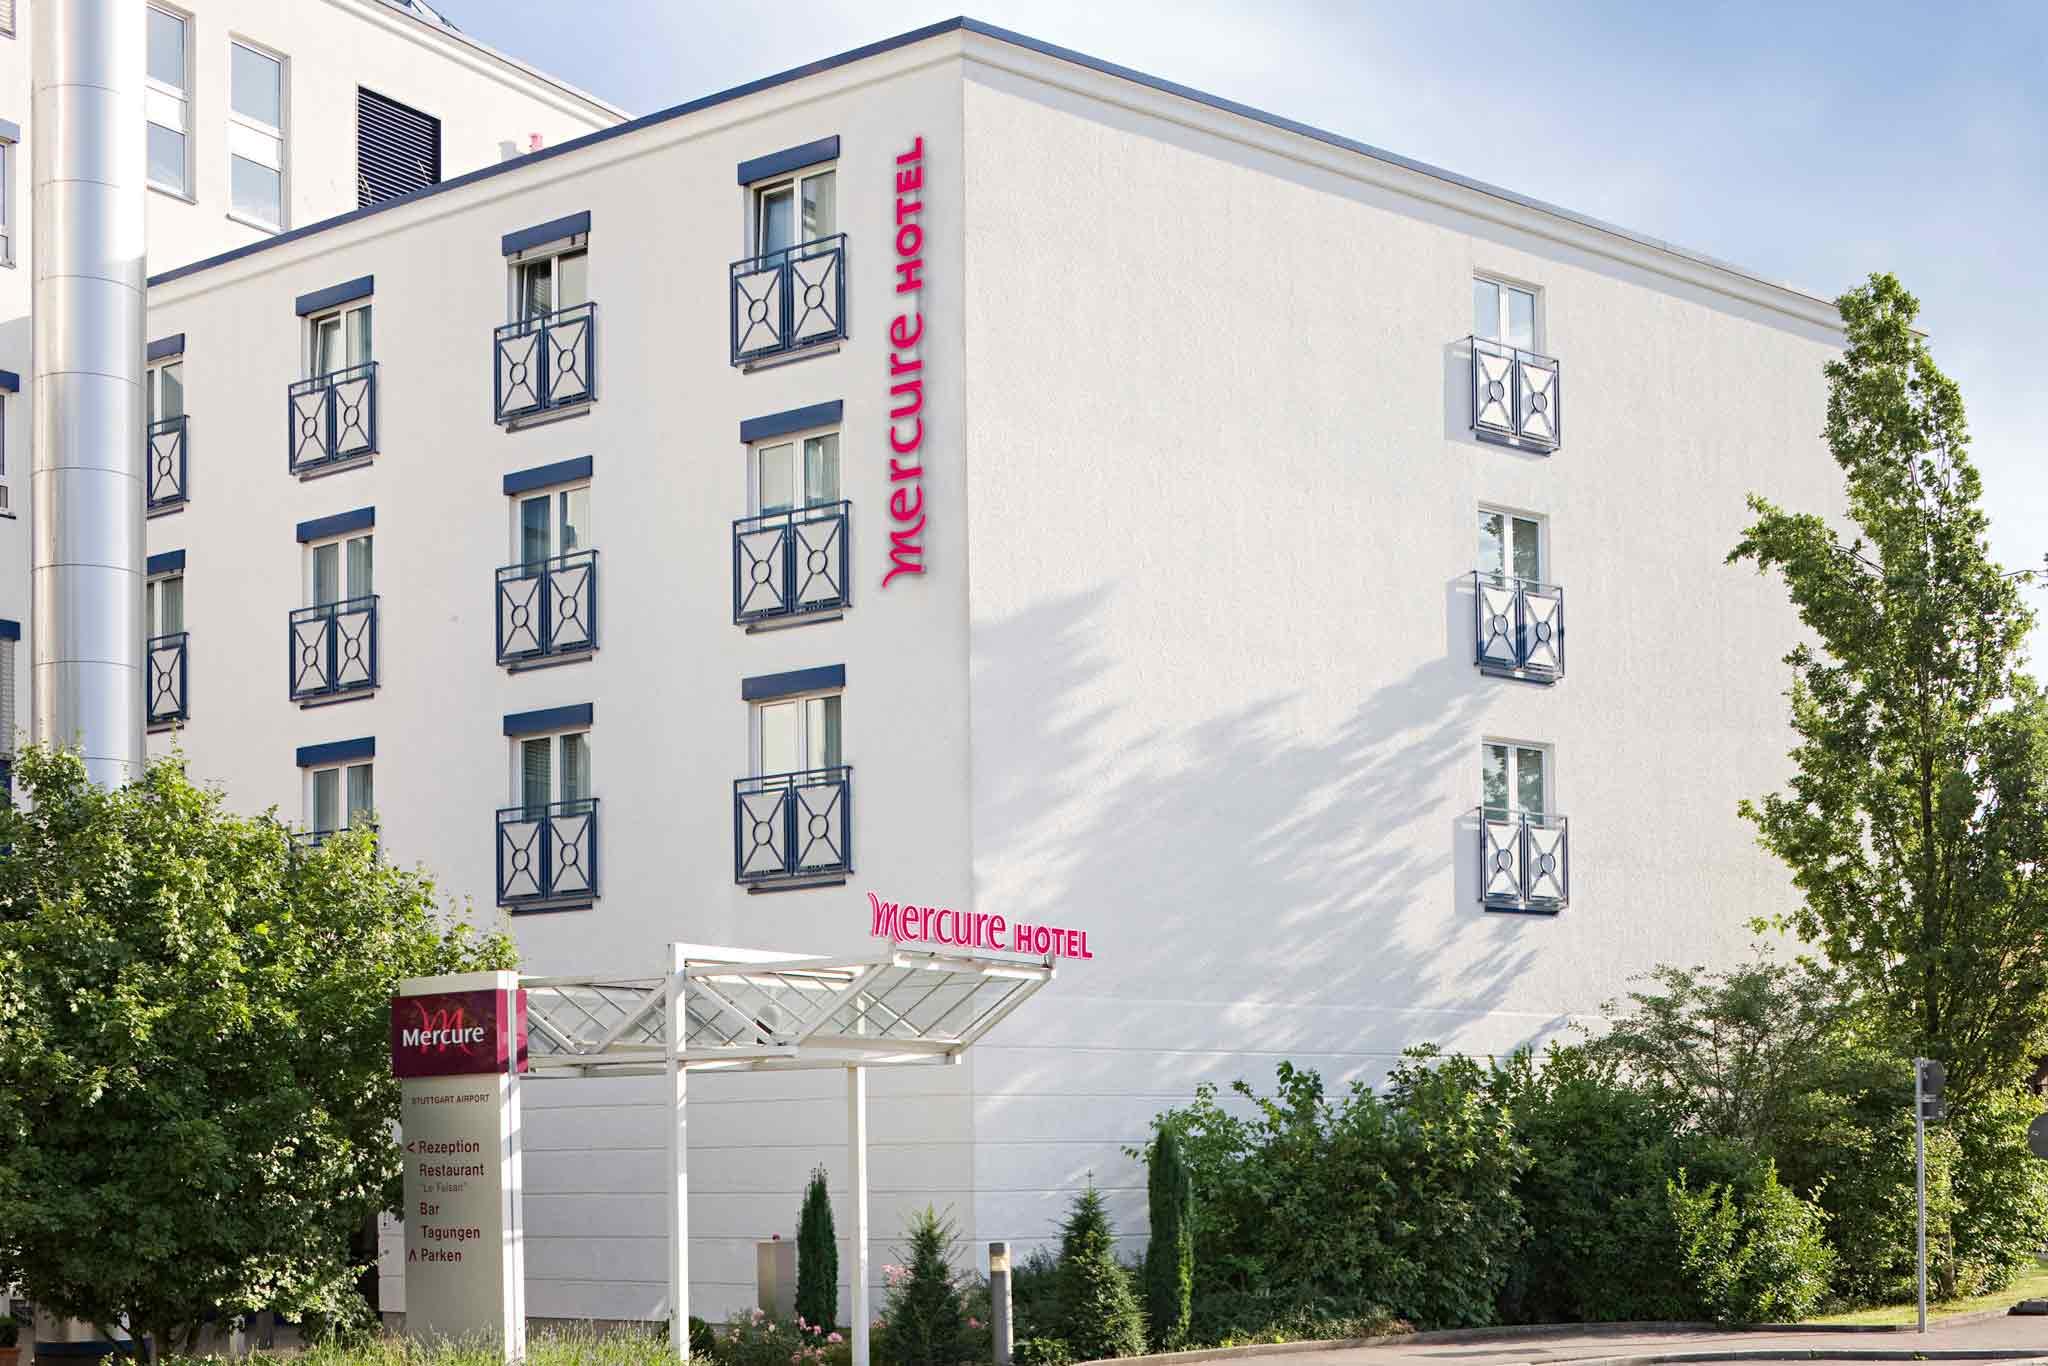 Mercure Hotel Stuttgart Airport Messe Exterior 1